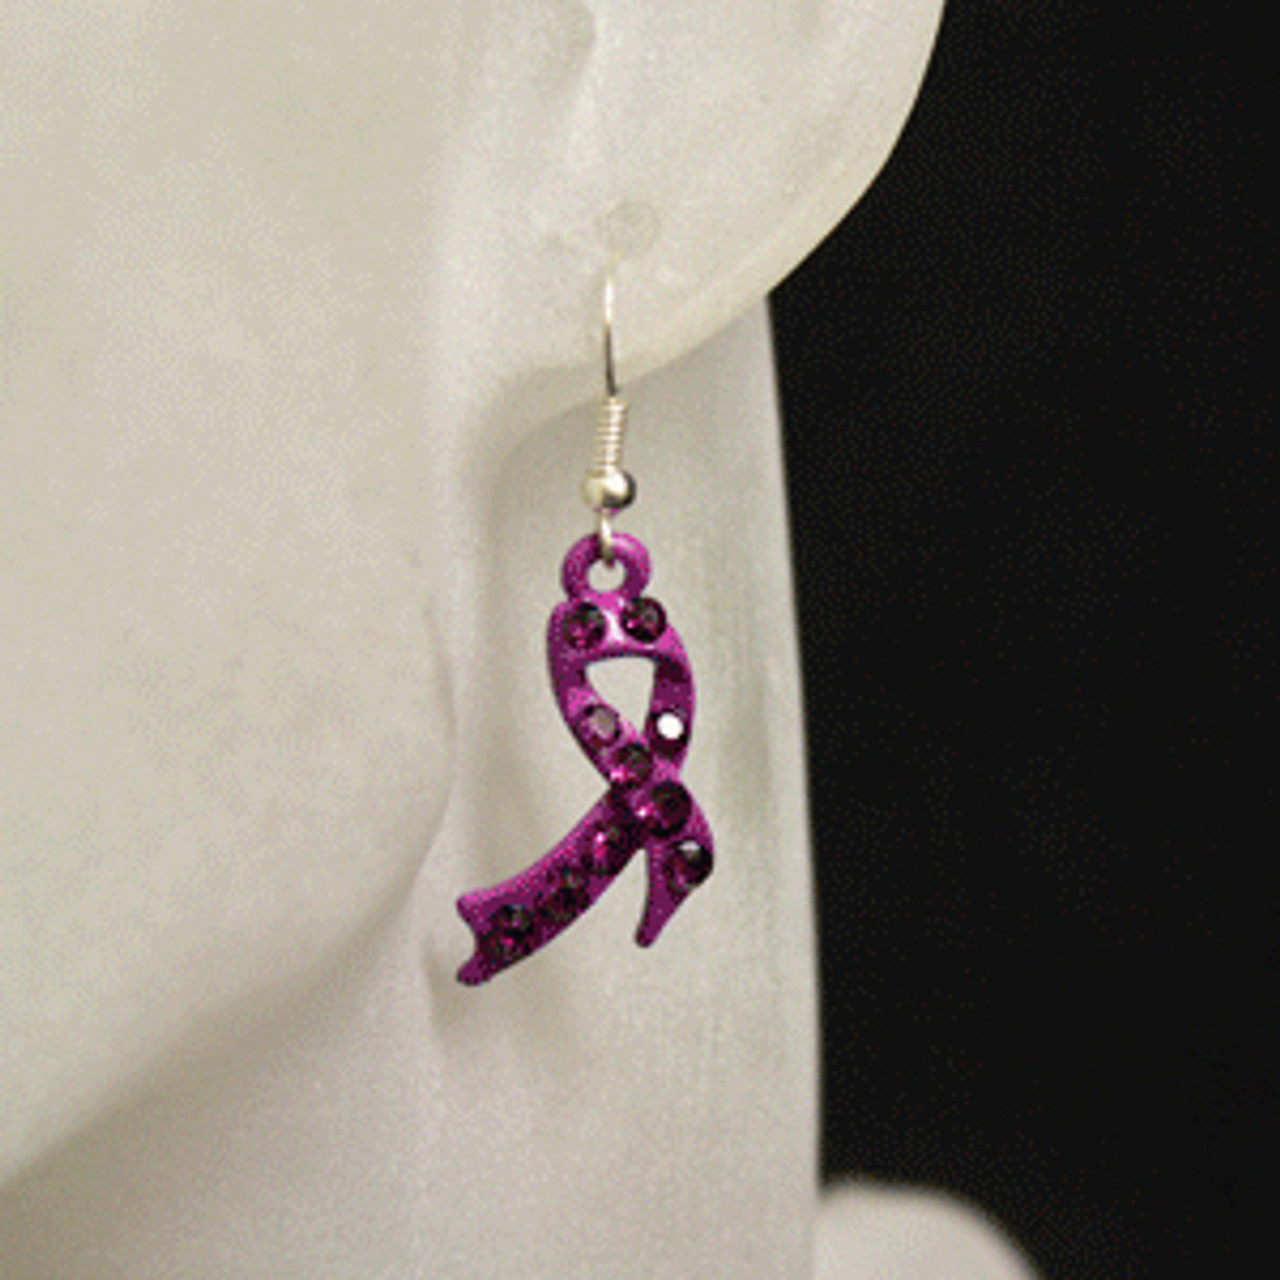 Purple charity or awareness ribbon earrings